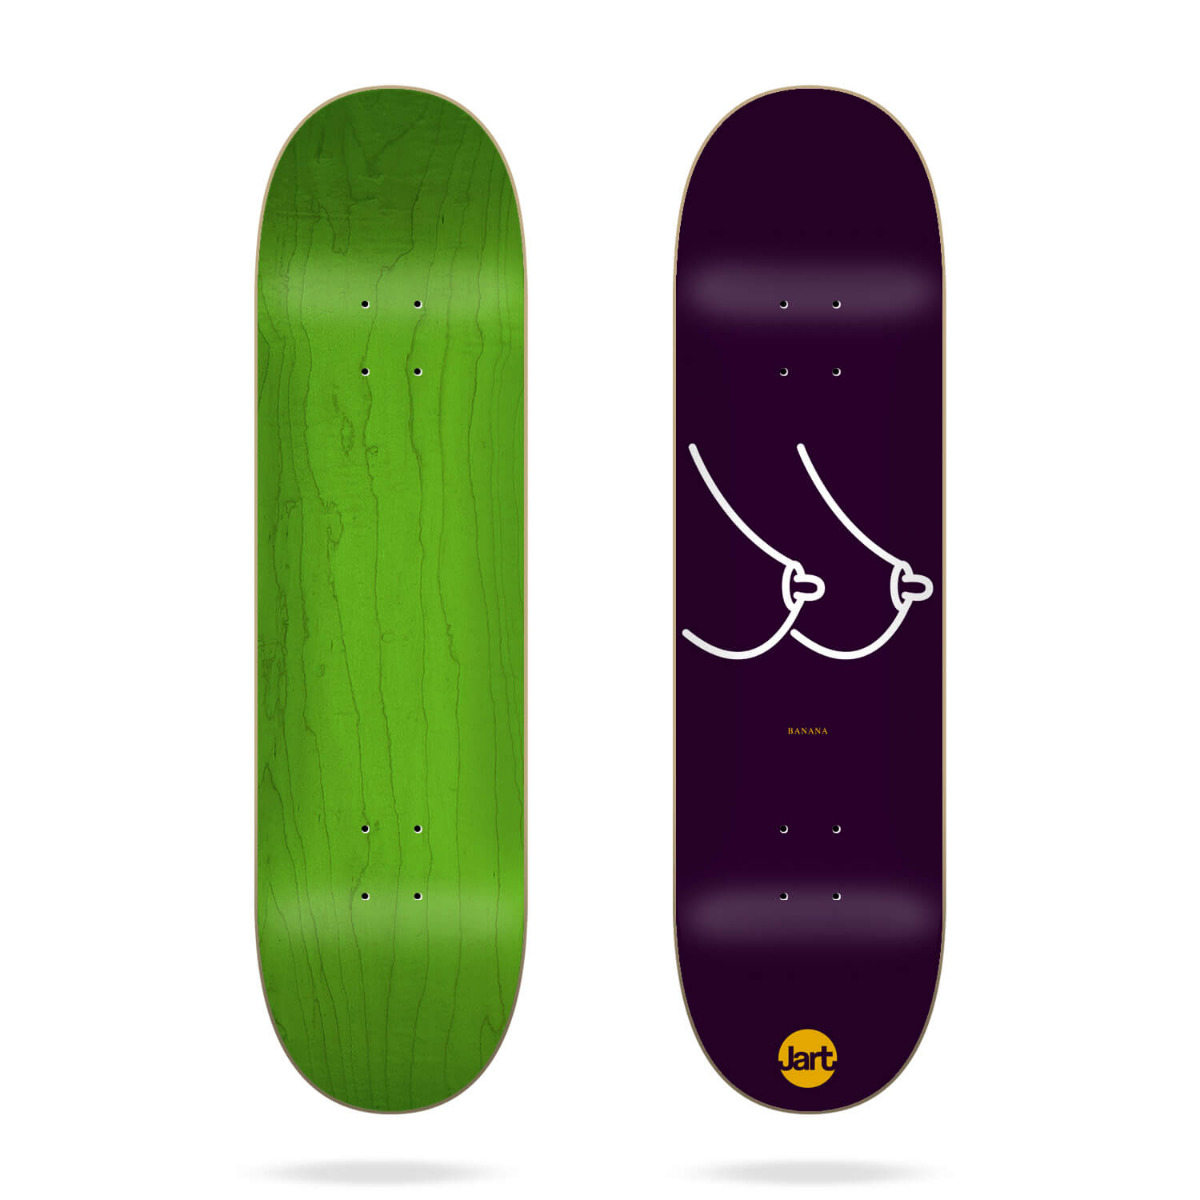 "Tabla de Skate Jart Styles 8.0"""